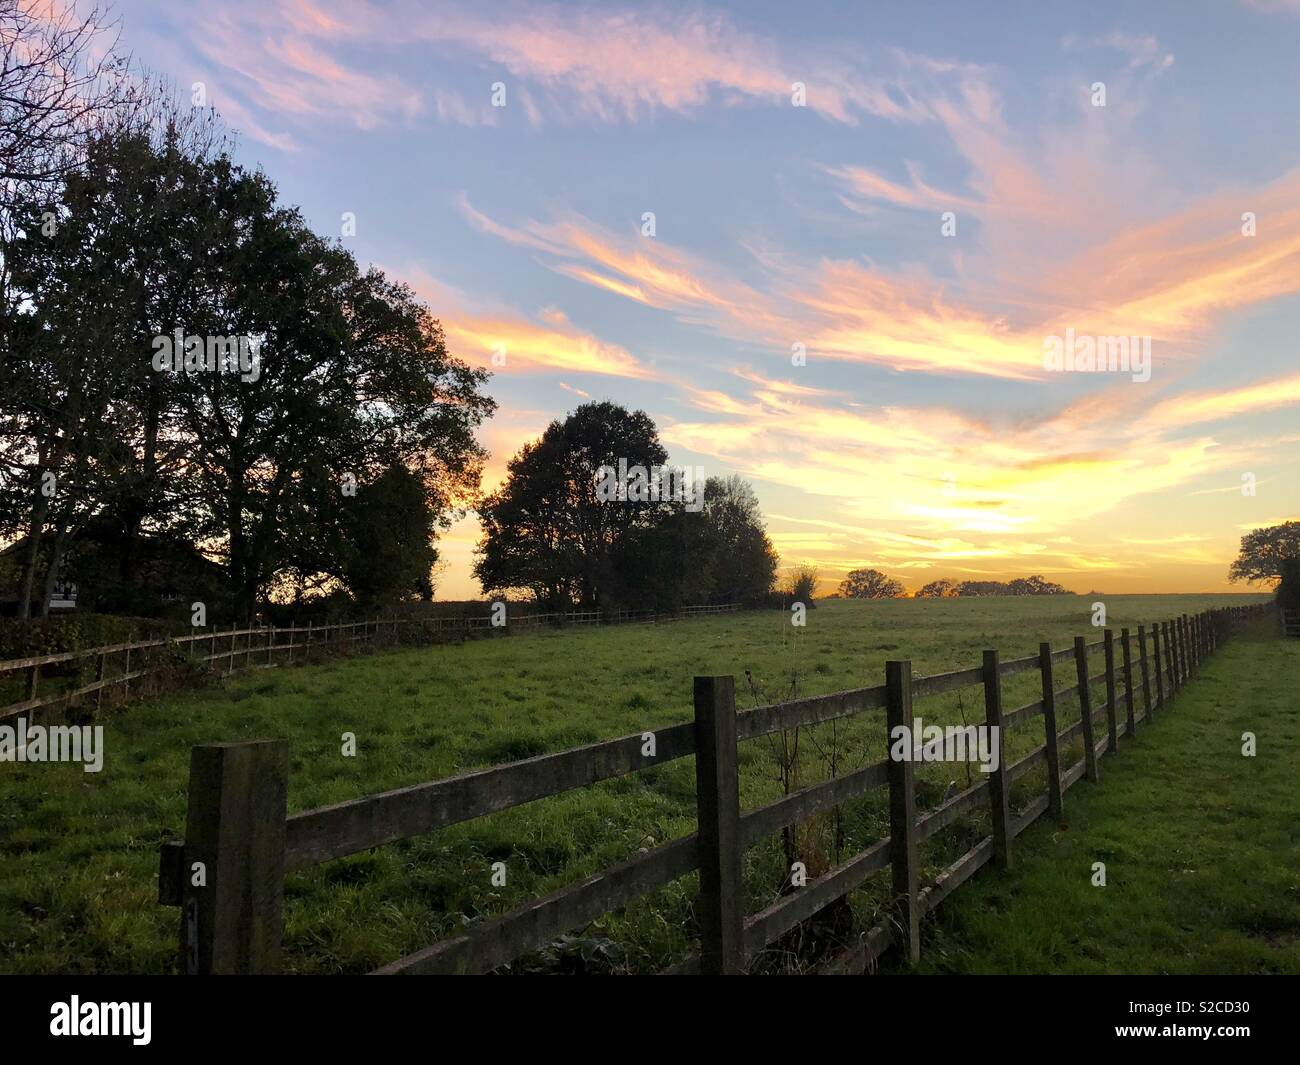 Sunset over farm lands. - Stock Image